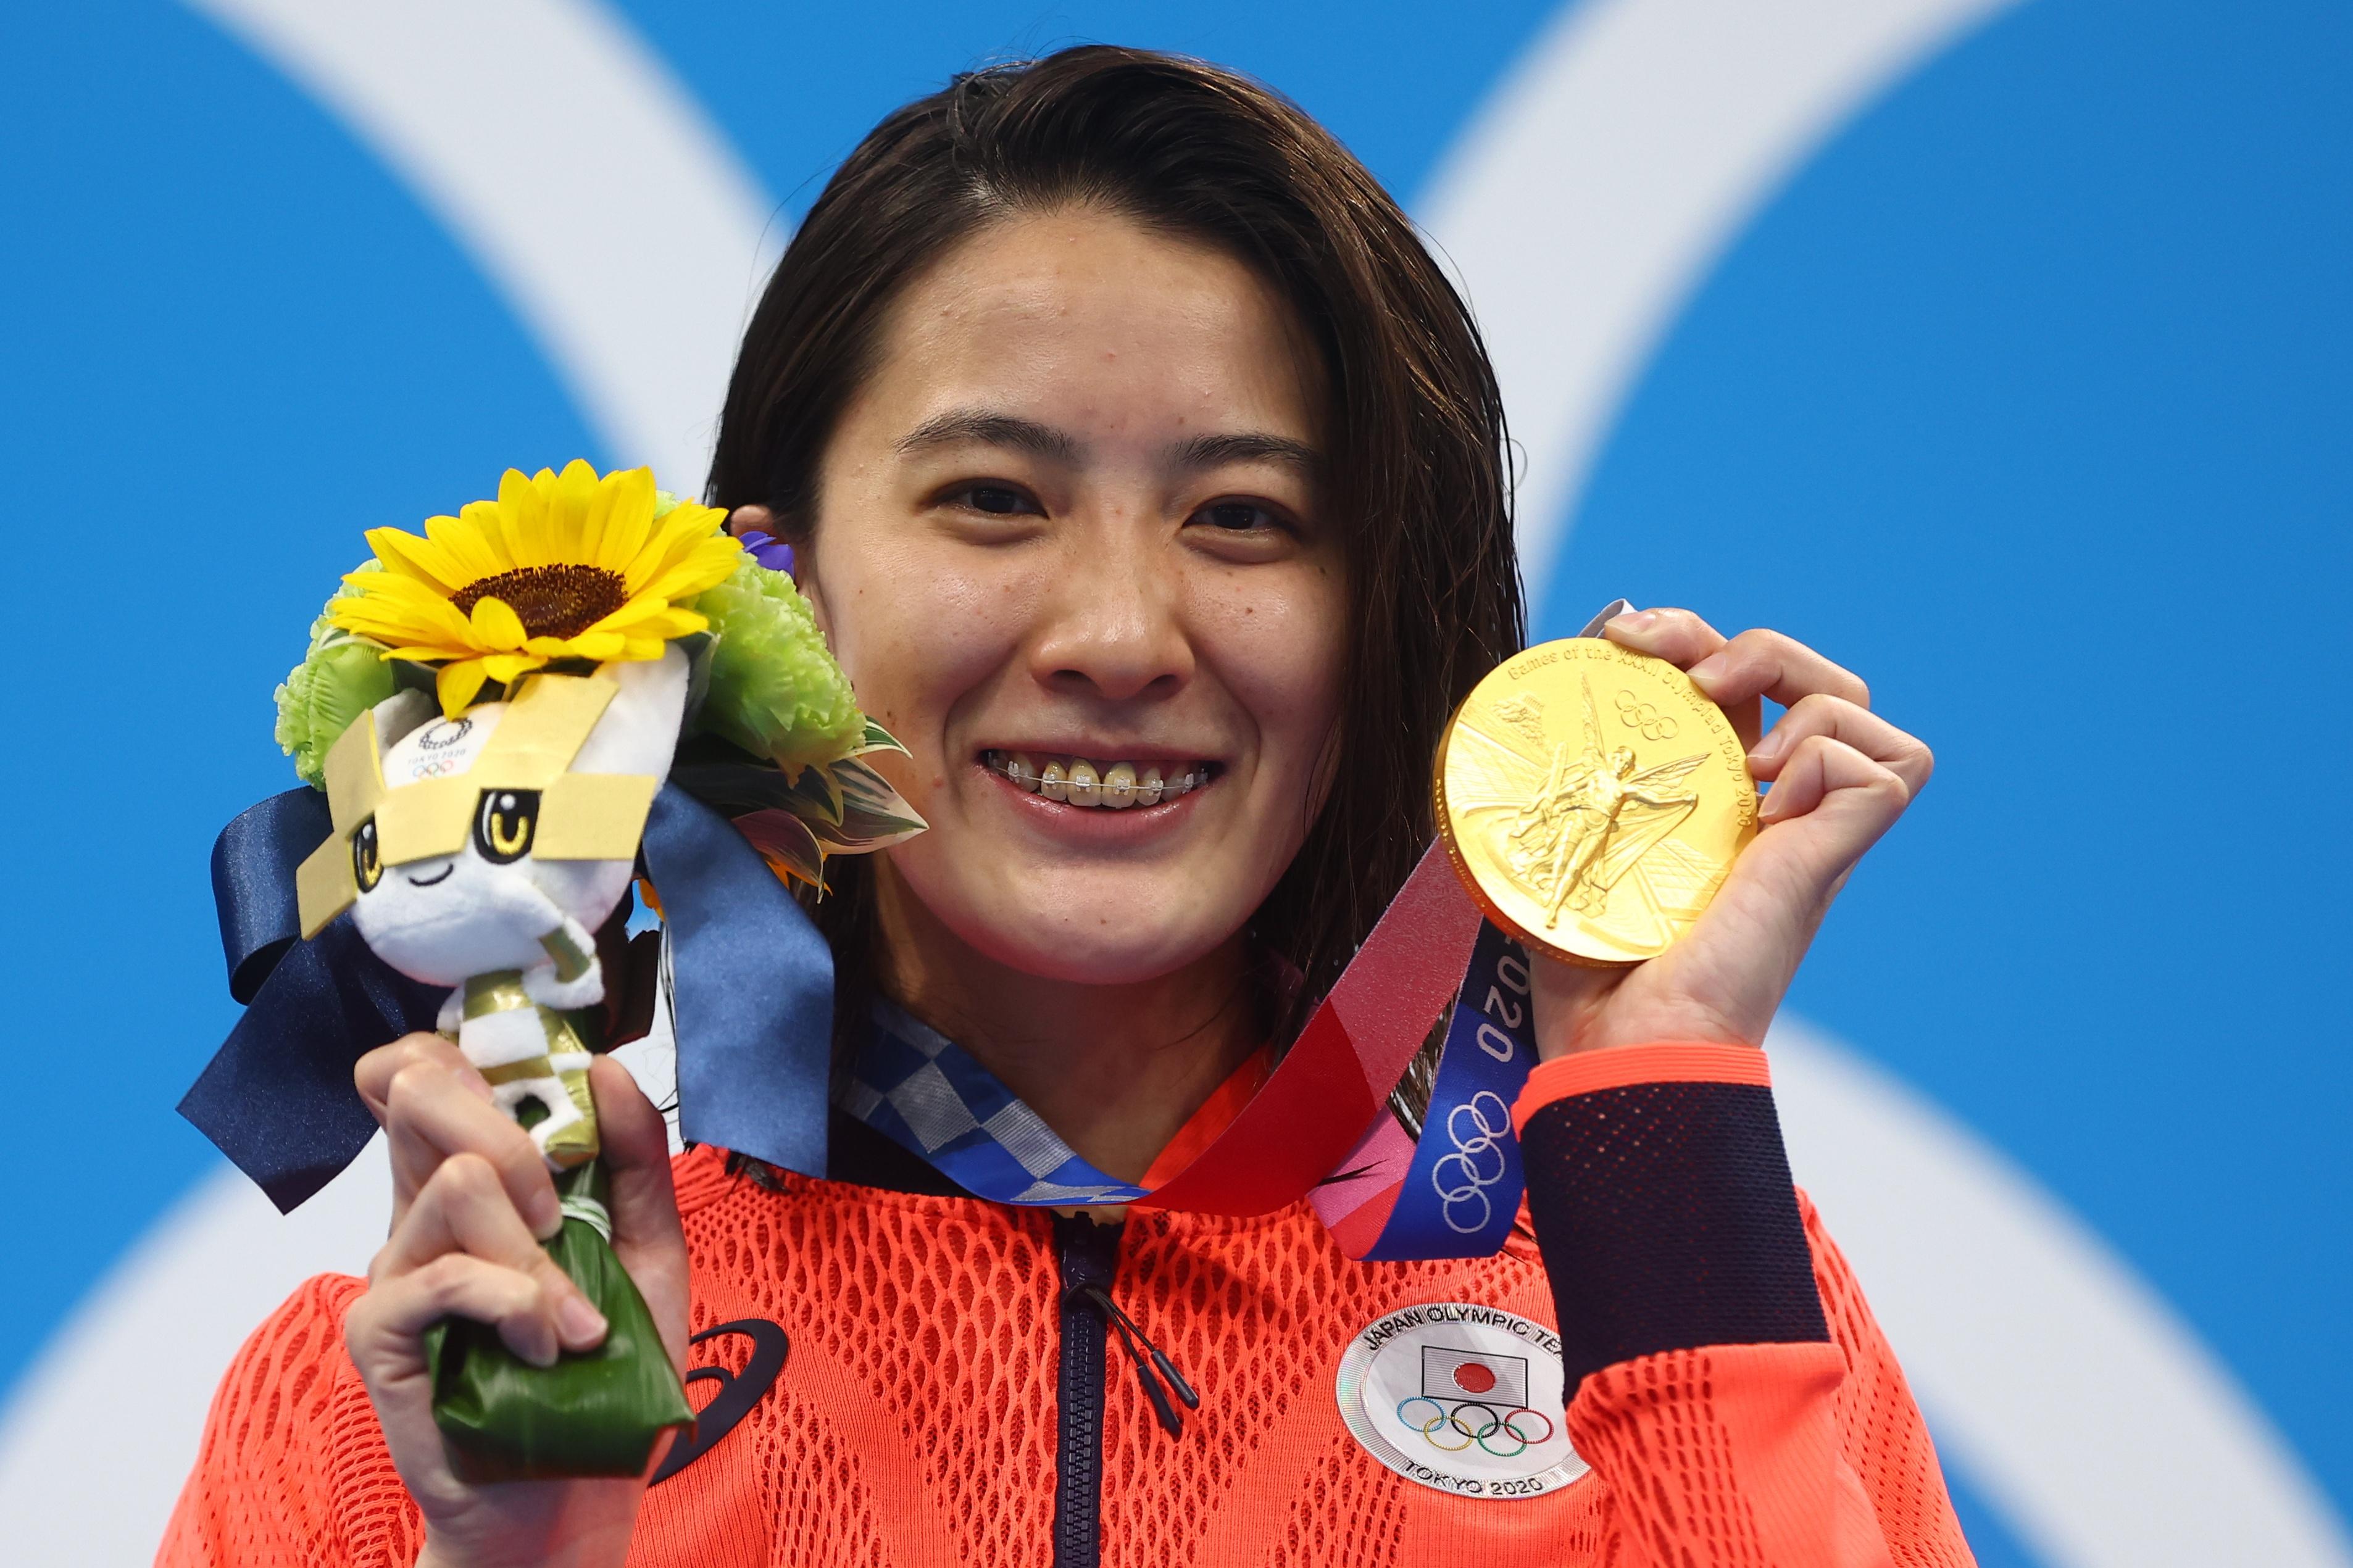 Tokyo 2020 Olympics - Swimming - Women's 200m Individual Medley - Medal Ceremony - Tokyo Aquatics Centre - Tokyo, Japan - July 28, 2021. Yui Ohashi of Japan poses with her gold medal REUTERS/Kai Pfaffenbach